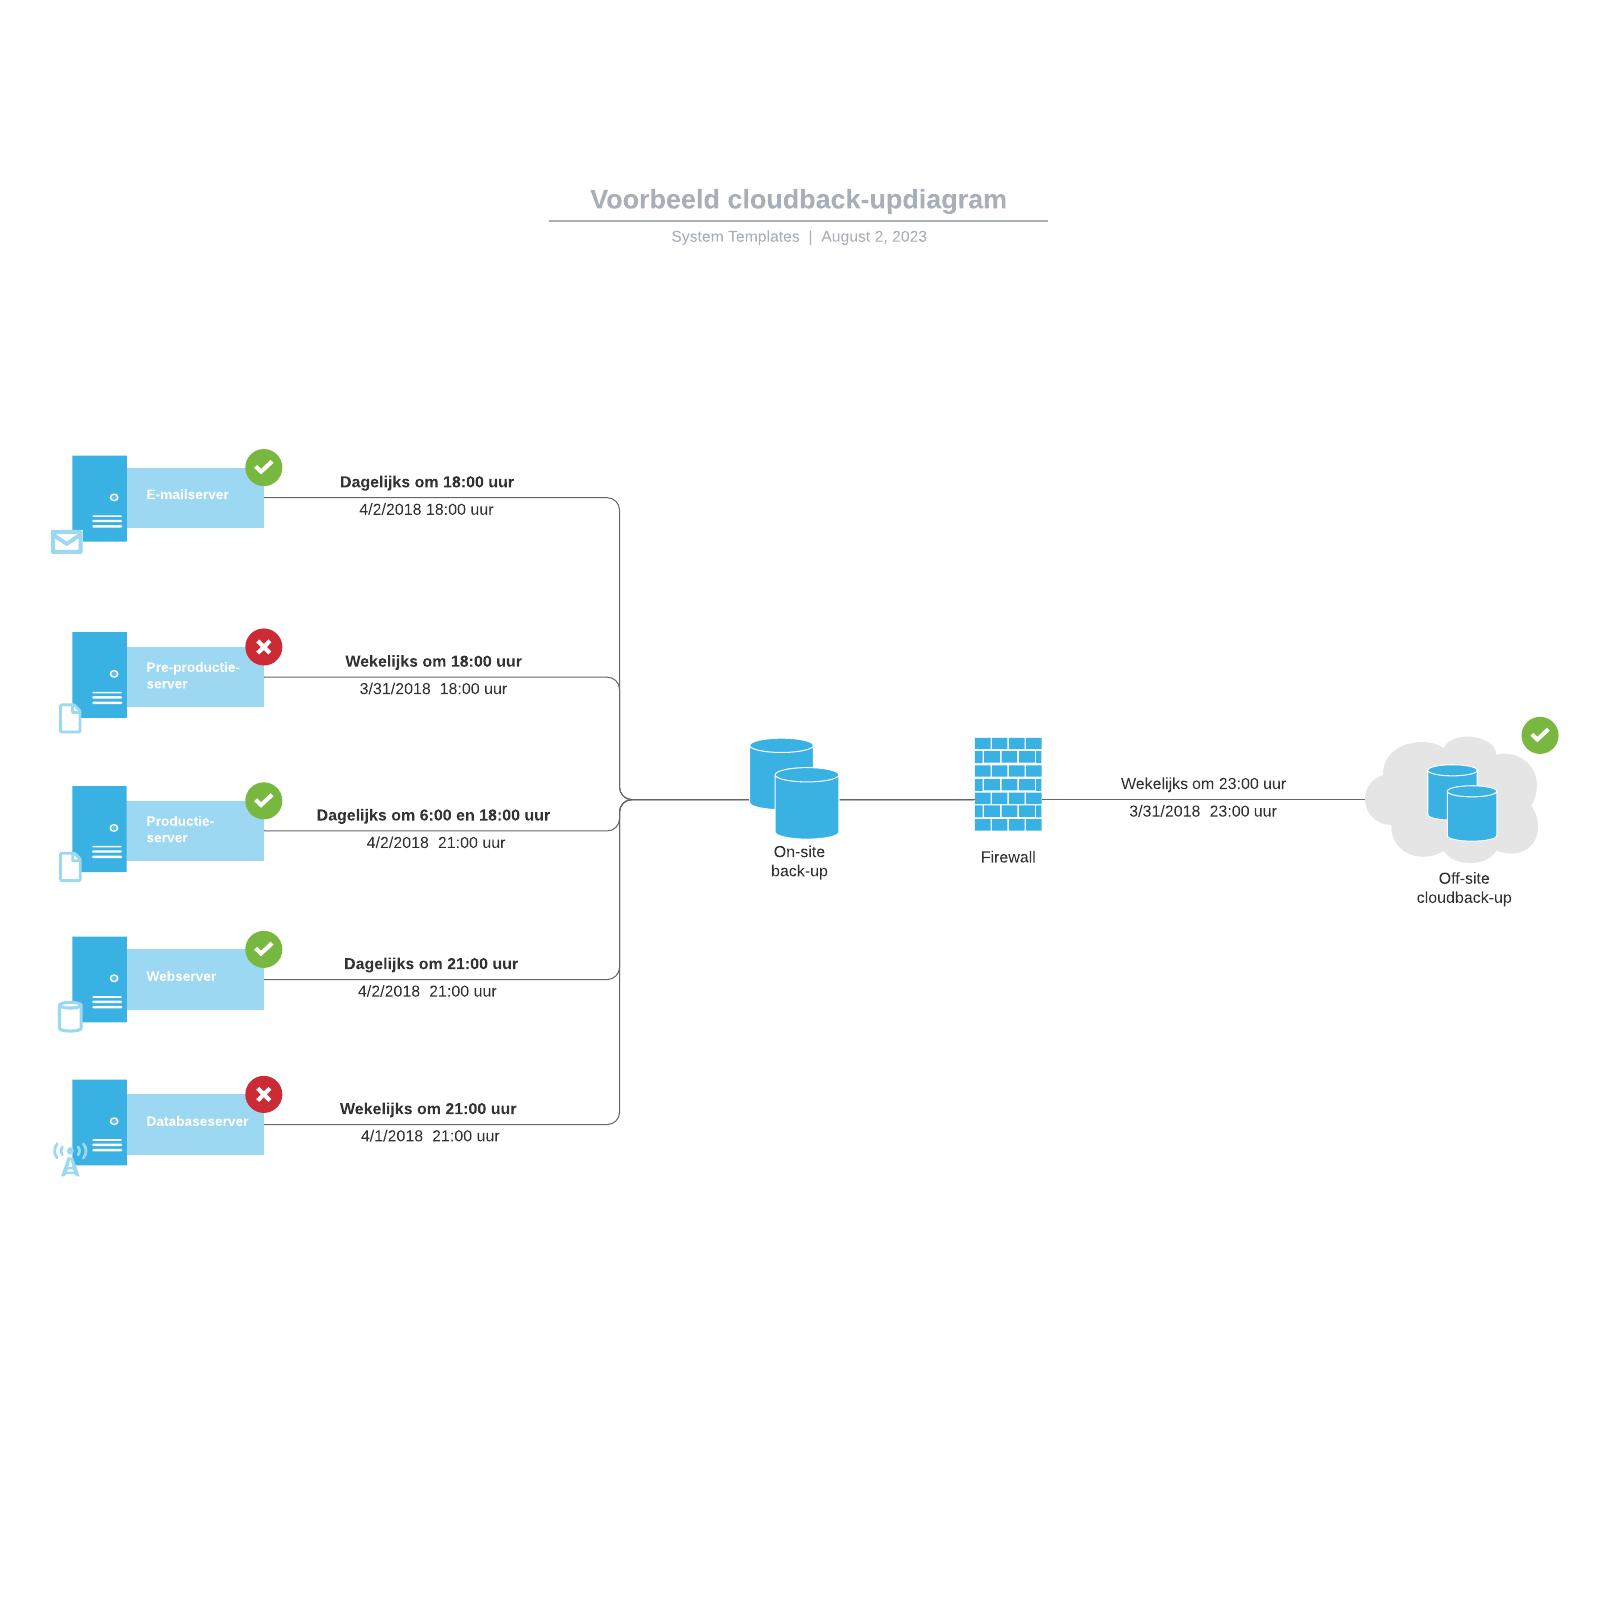 Voorbeeld cloudback-updiagram